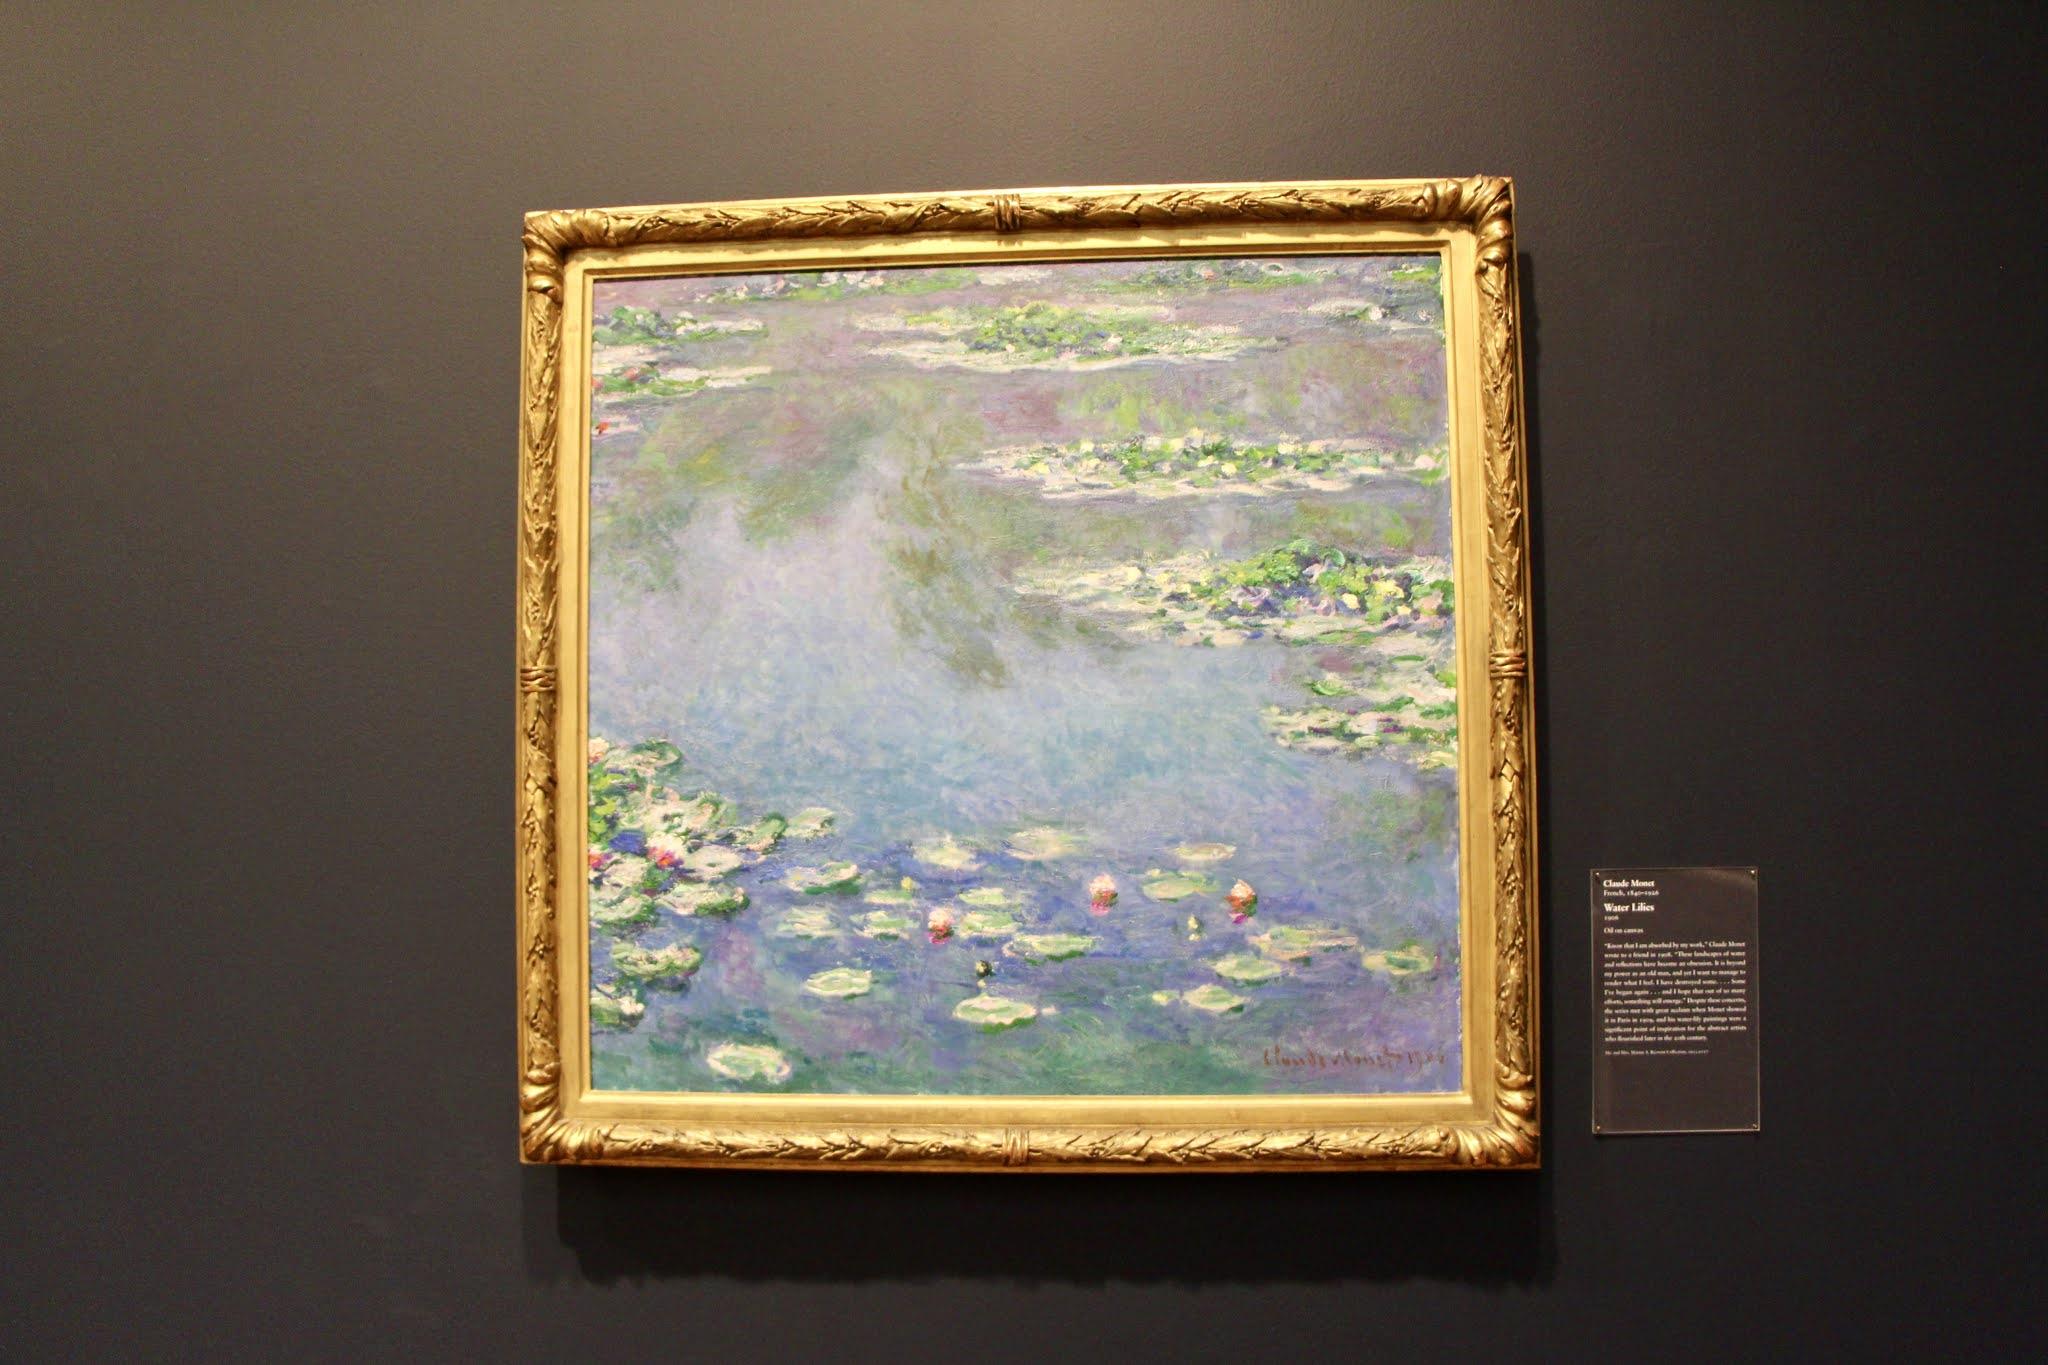 monet, impressionism, museum, painting, art,